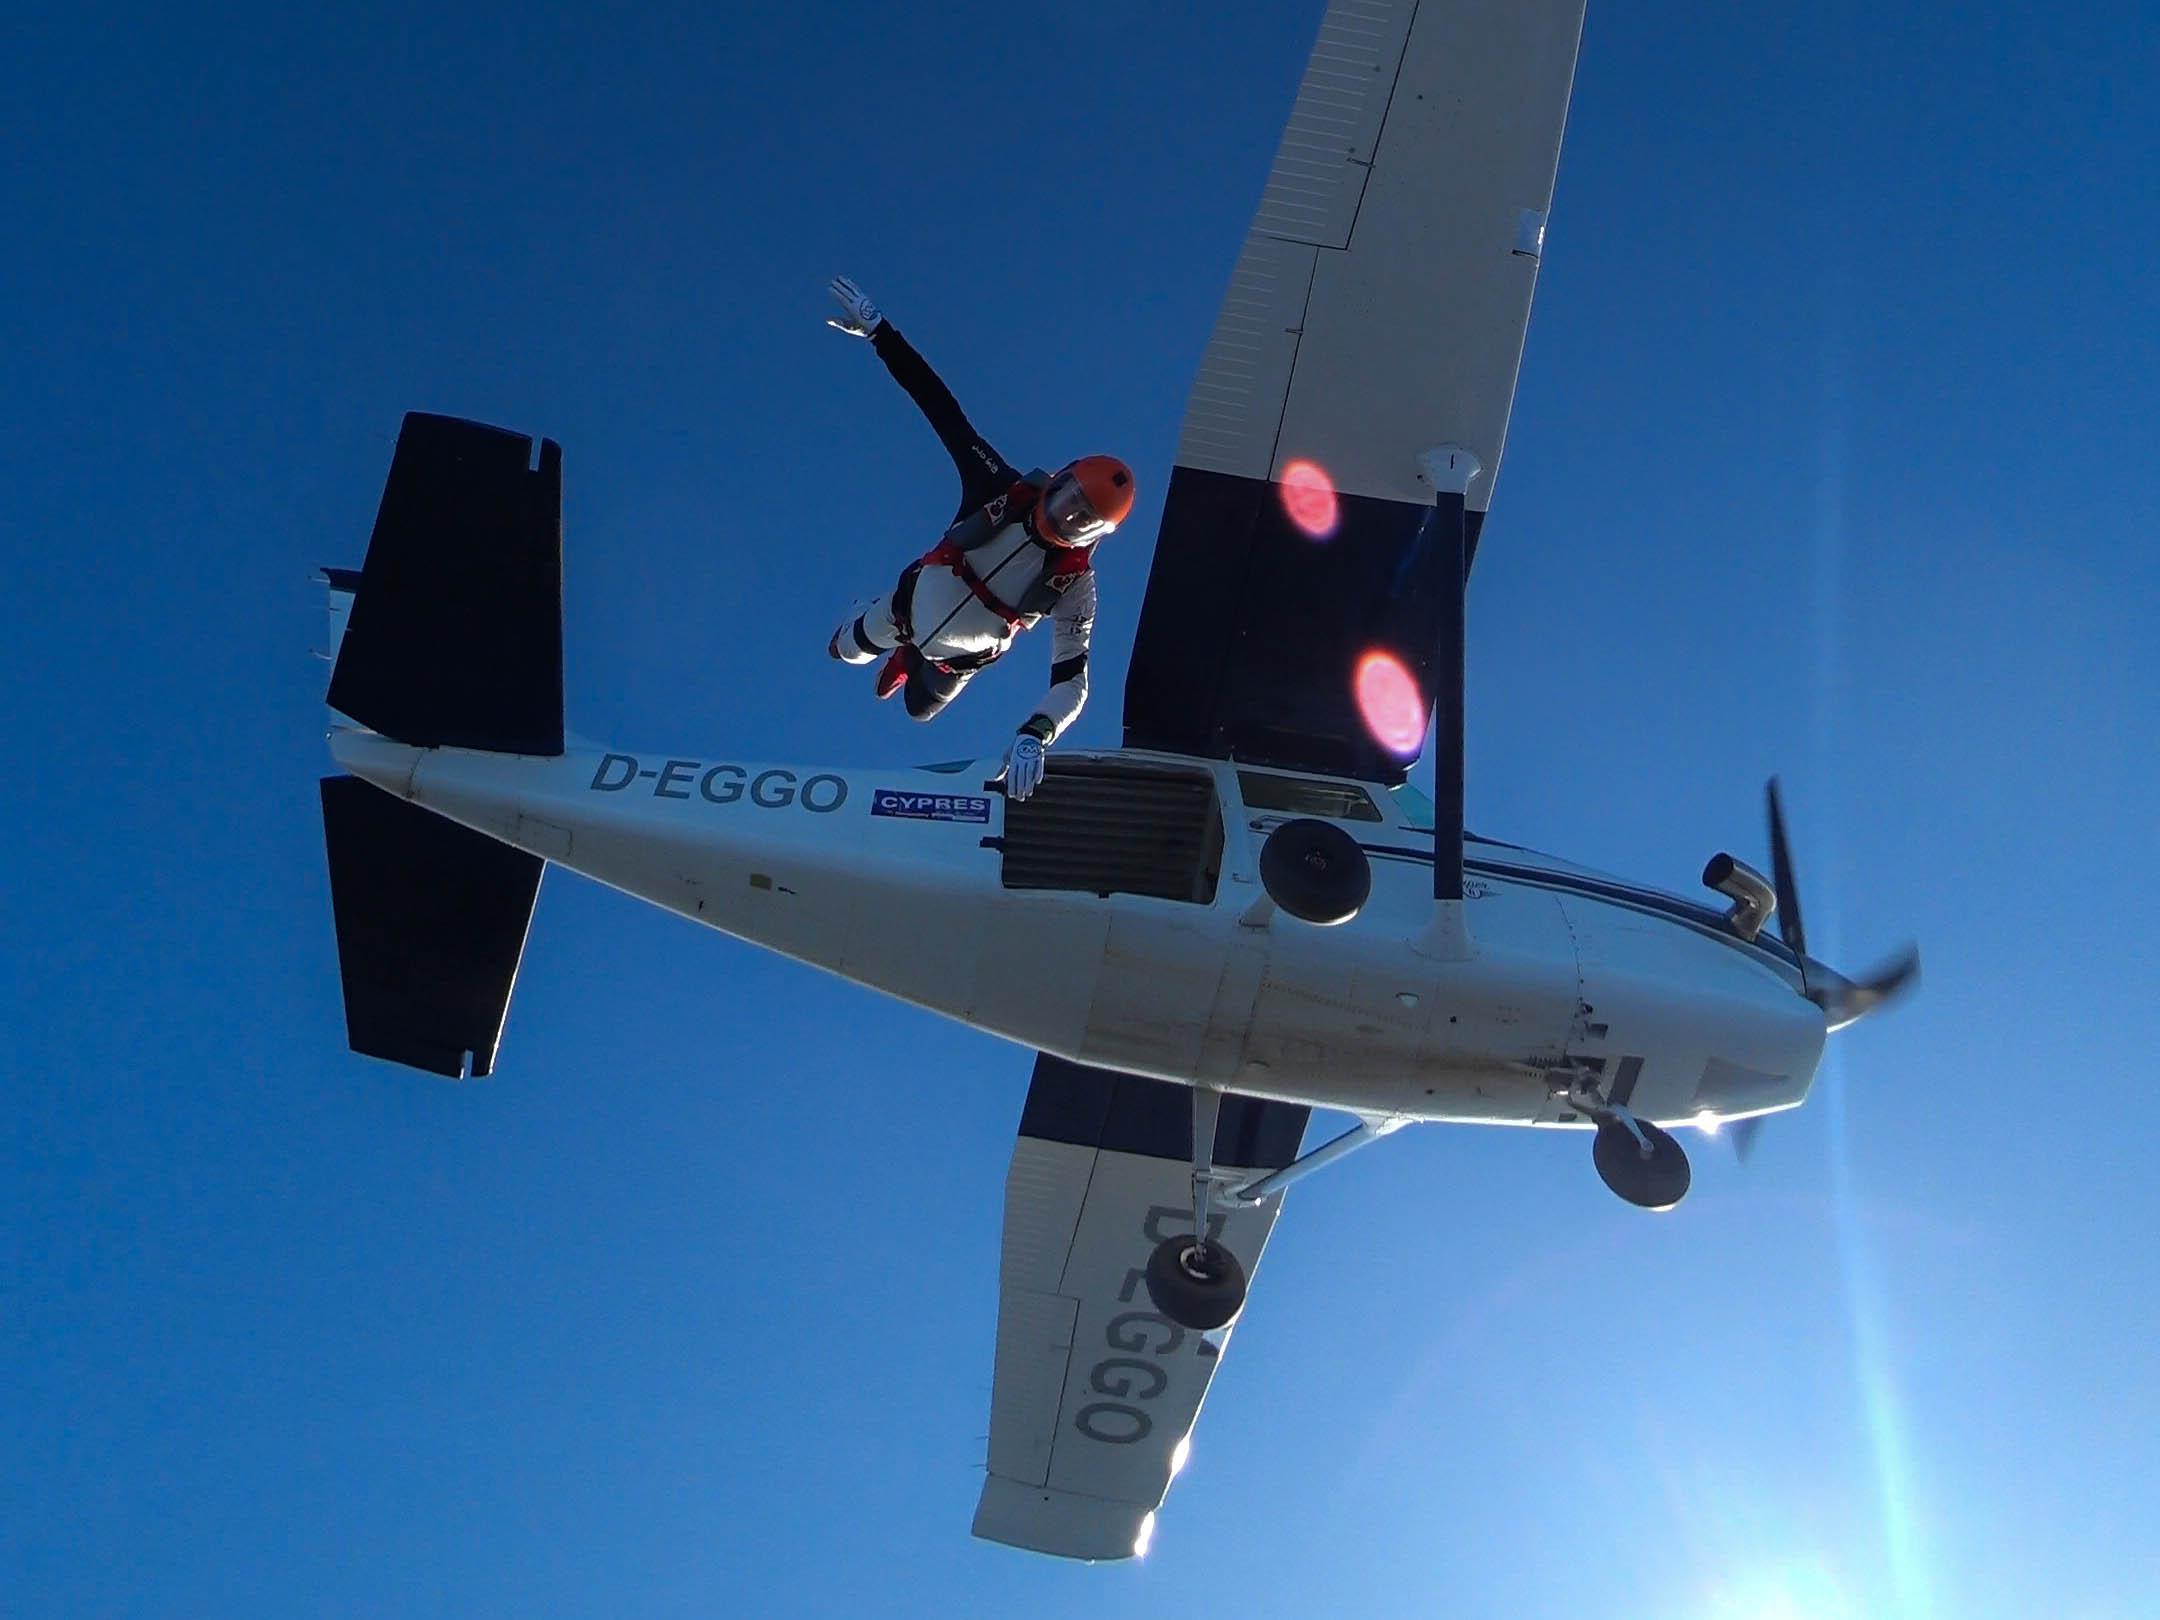 EGGO Exit - Comfortable skydiving aircraft